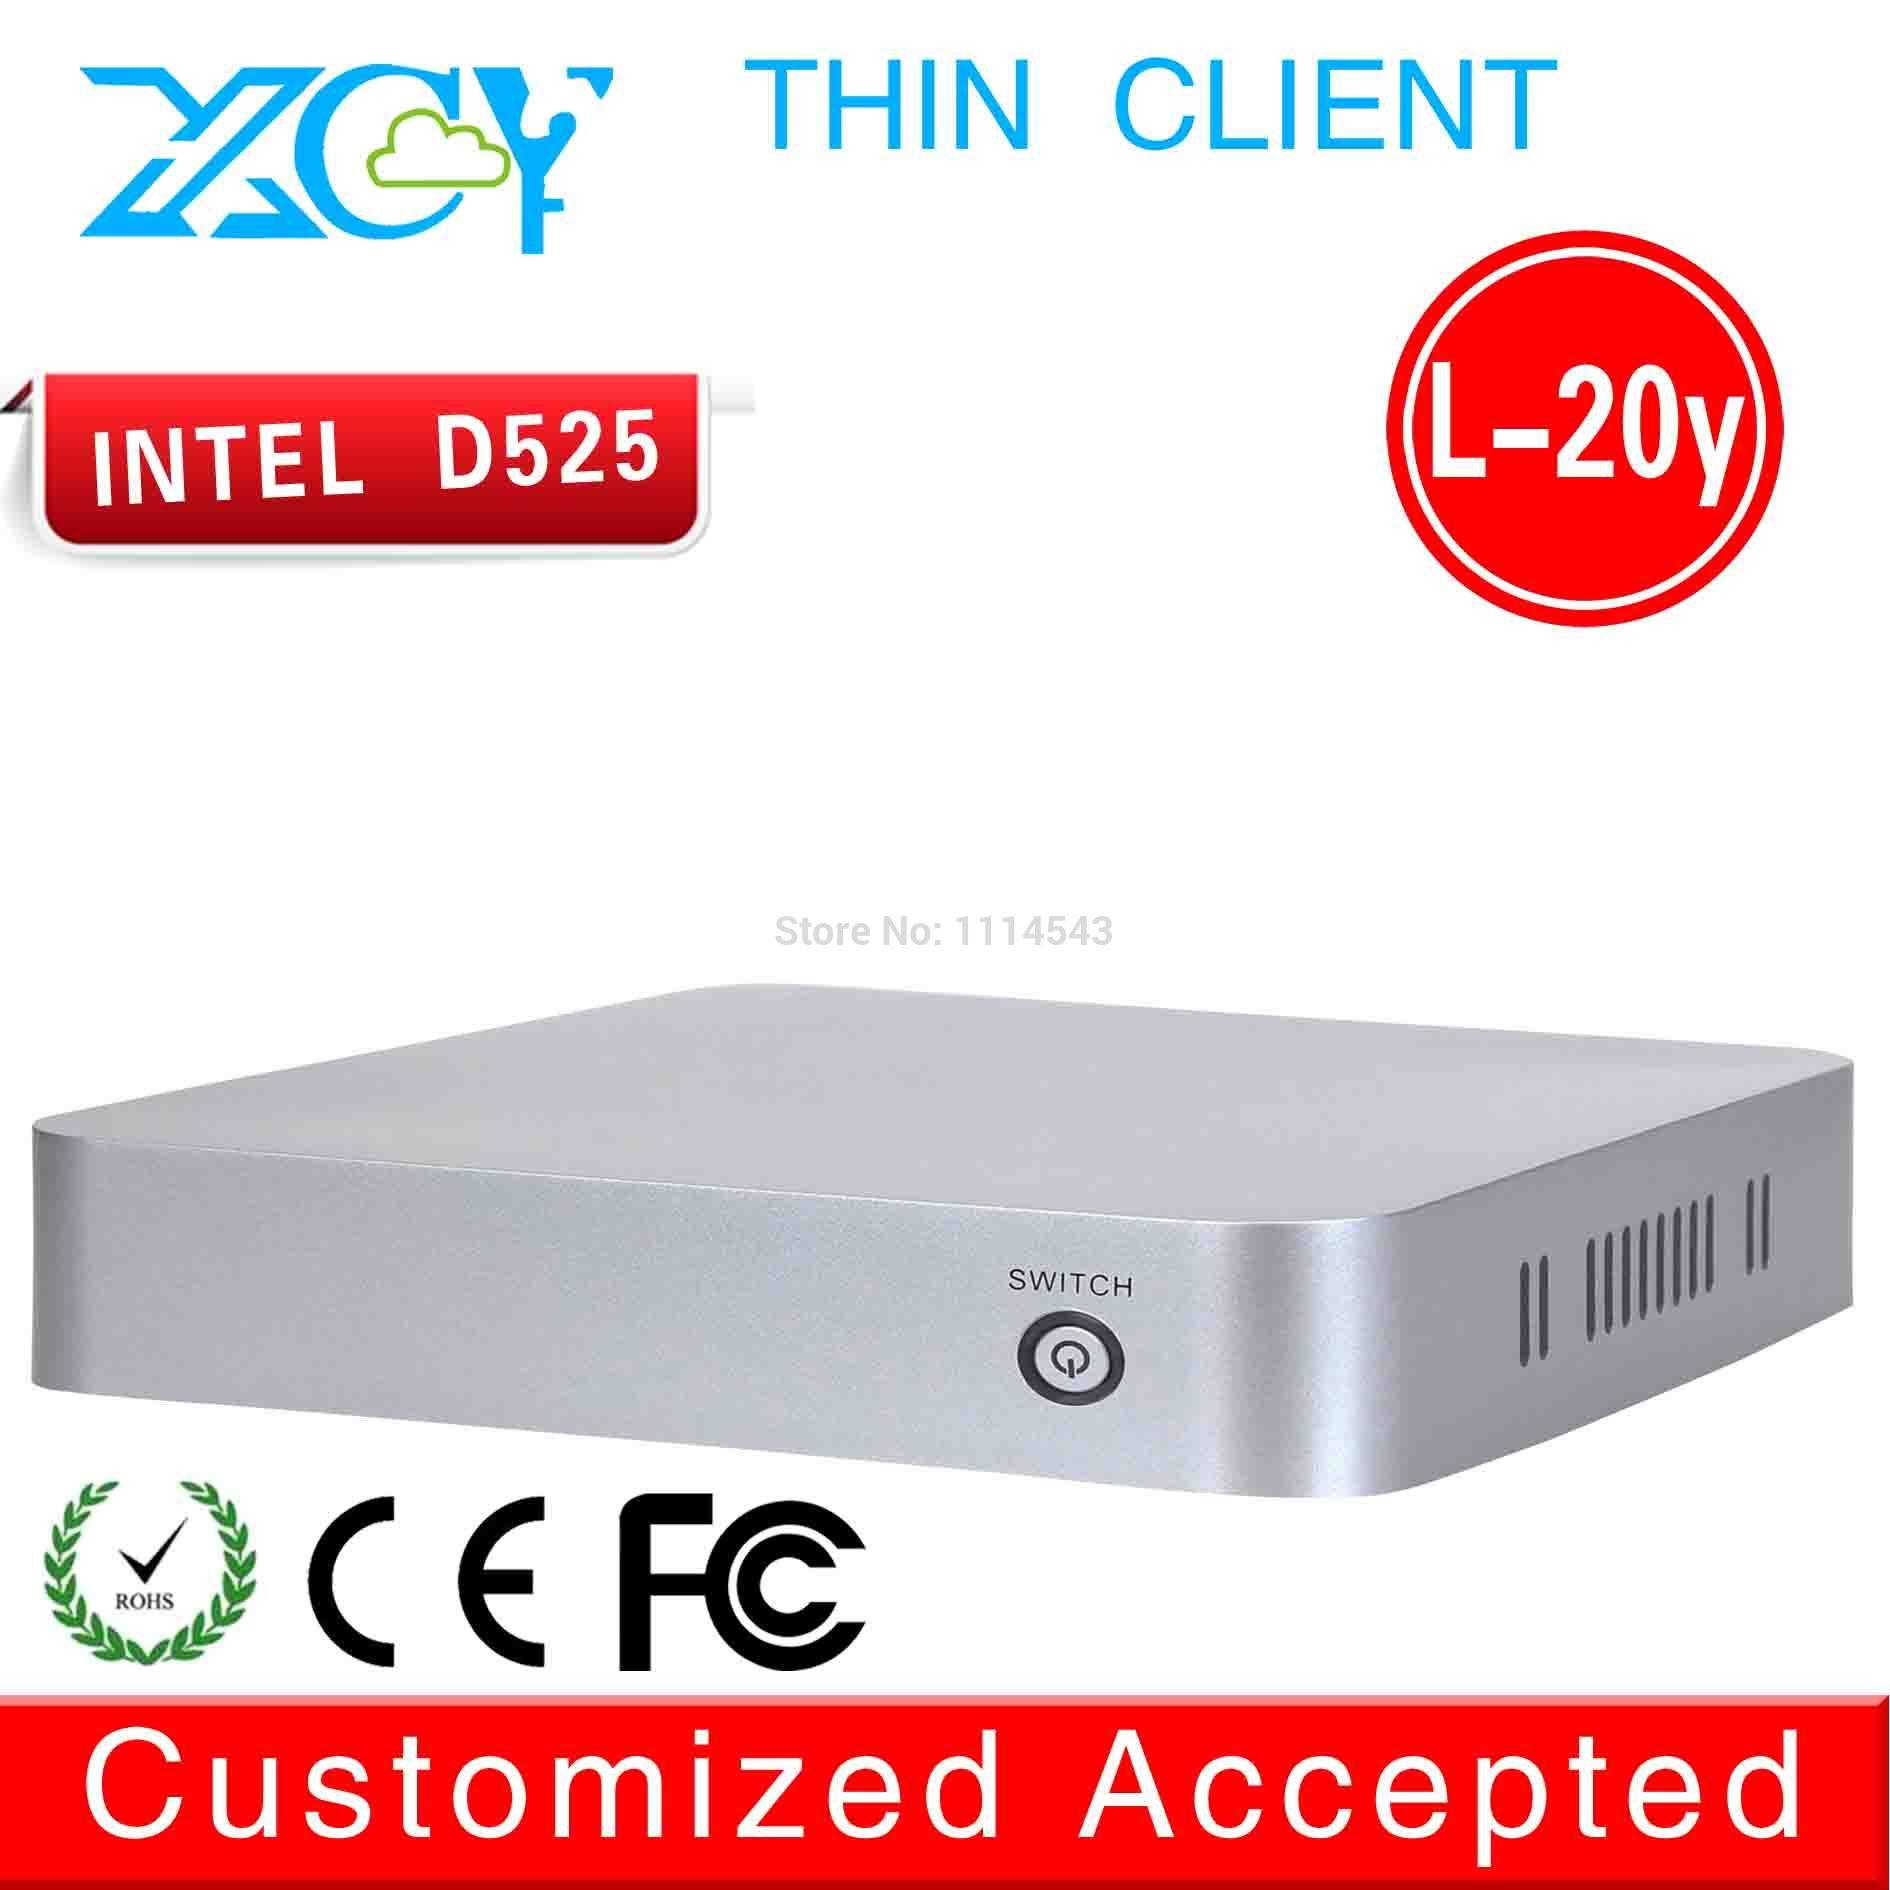 high performance high cpu mini pc l-20y mini business pc intel D525 network atom dual core fan desktop build-in-wifi(China (Mainland))